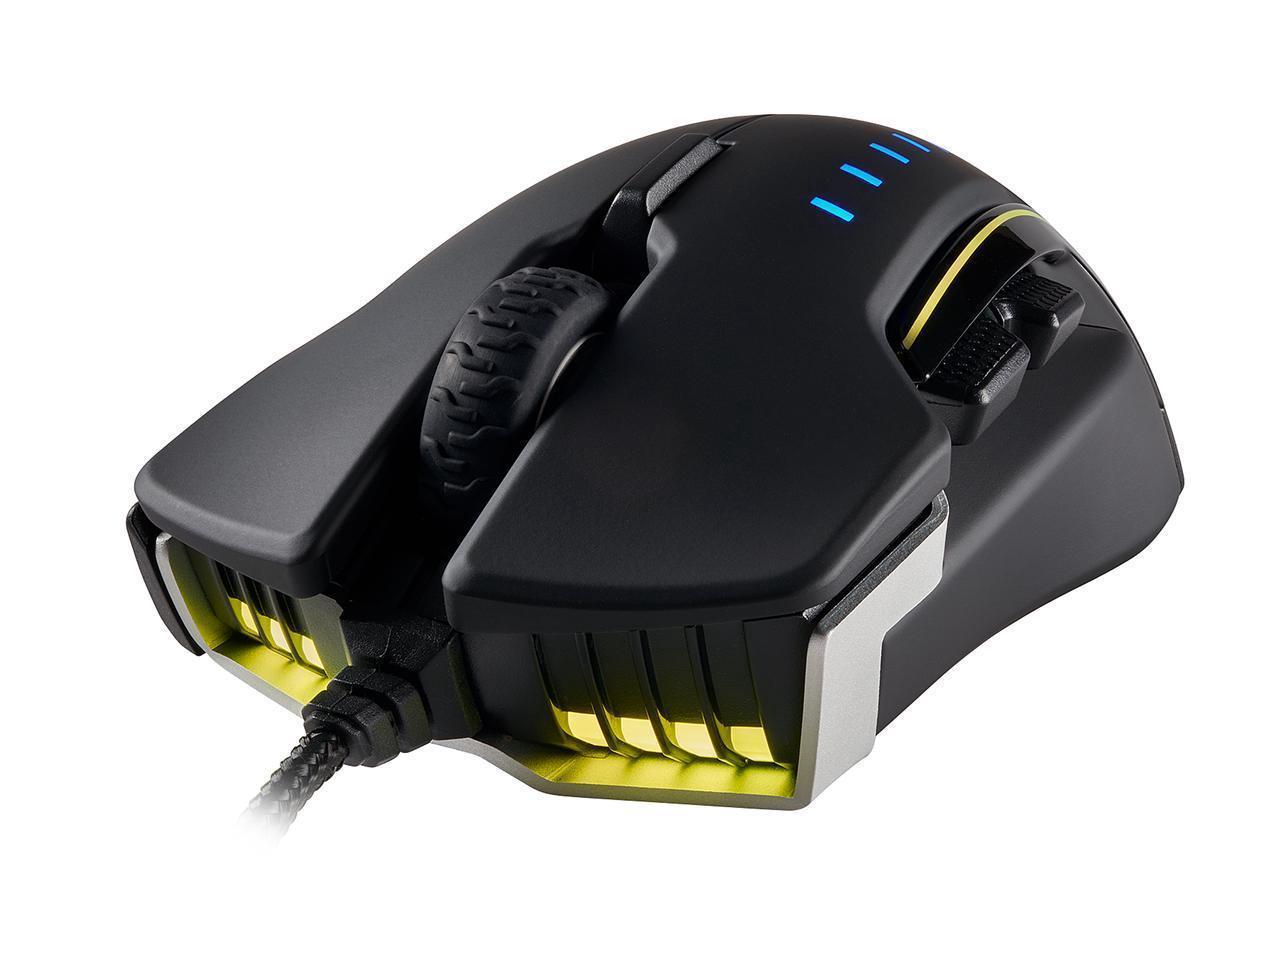 Corsair Gaming GLAIVE RGB Optical Gaming Mouse   Aluminum